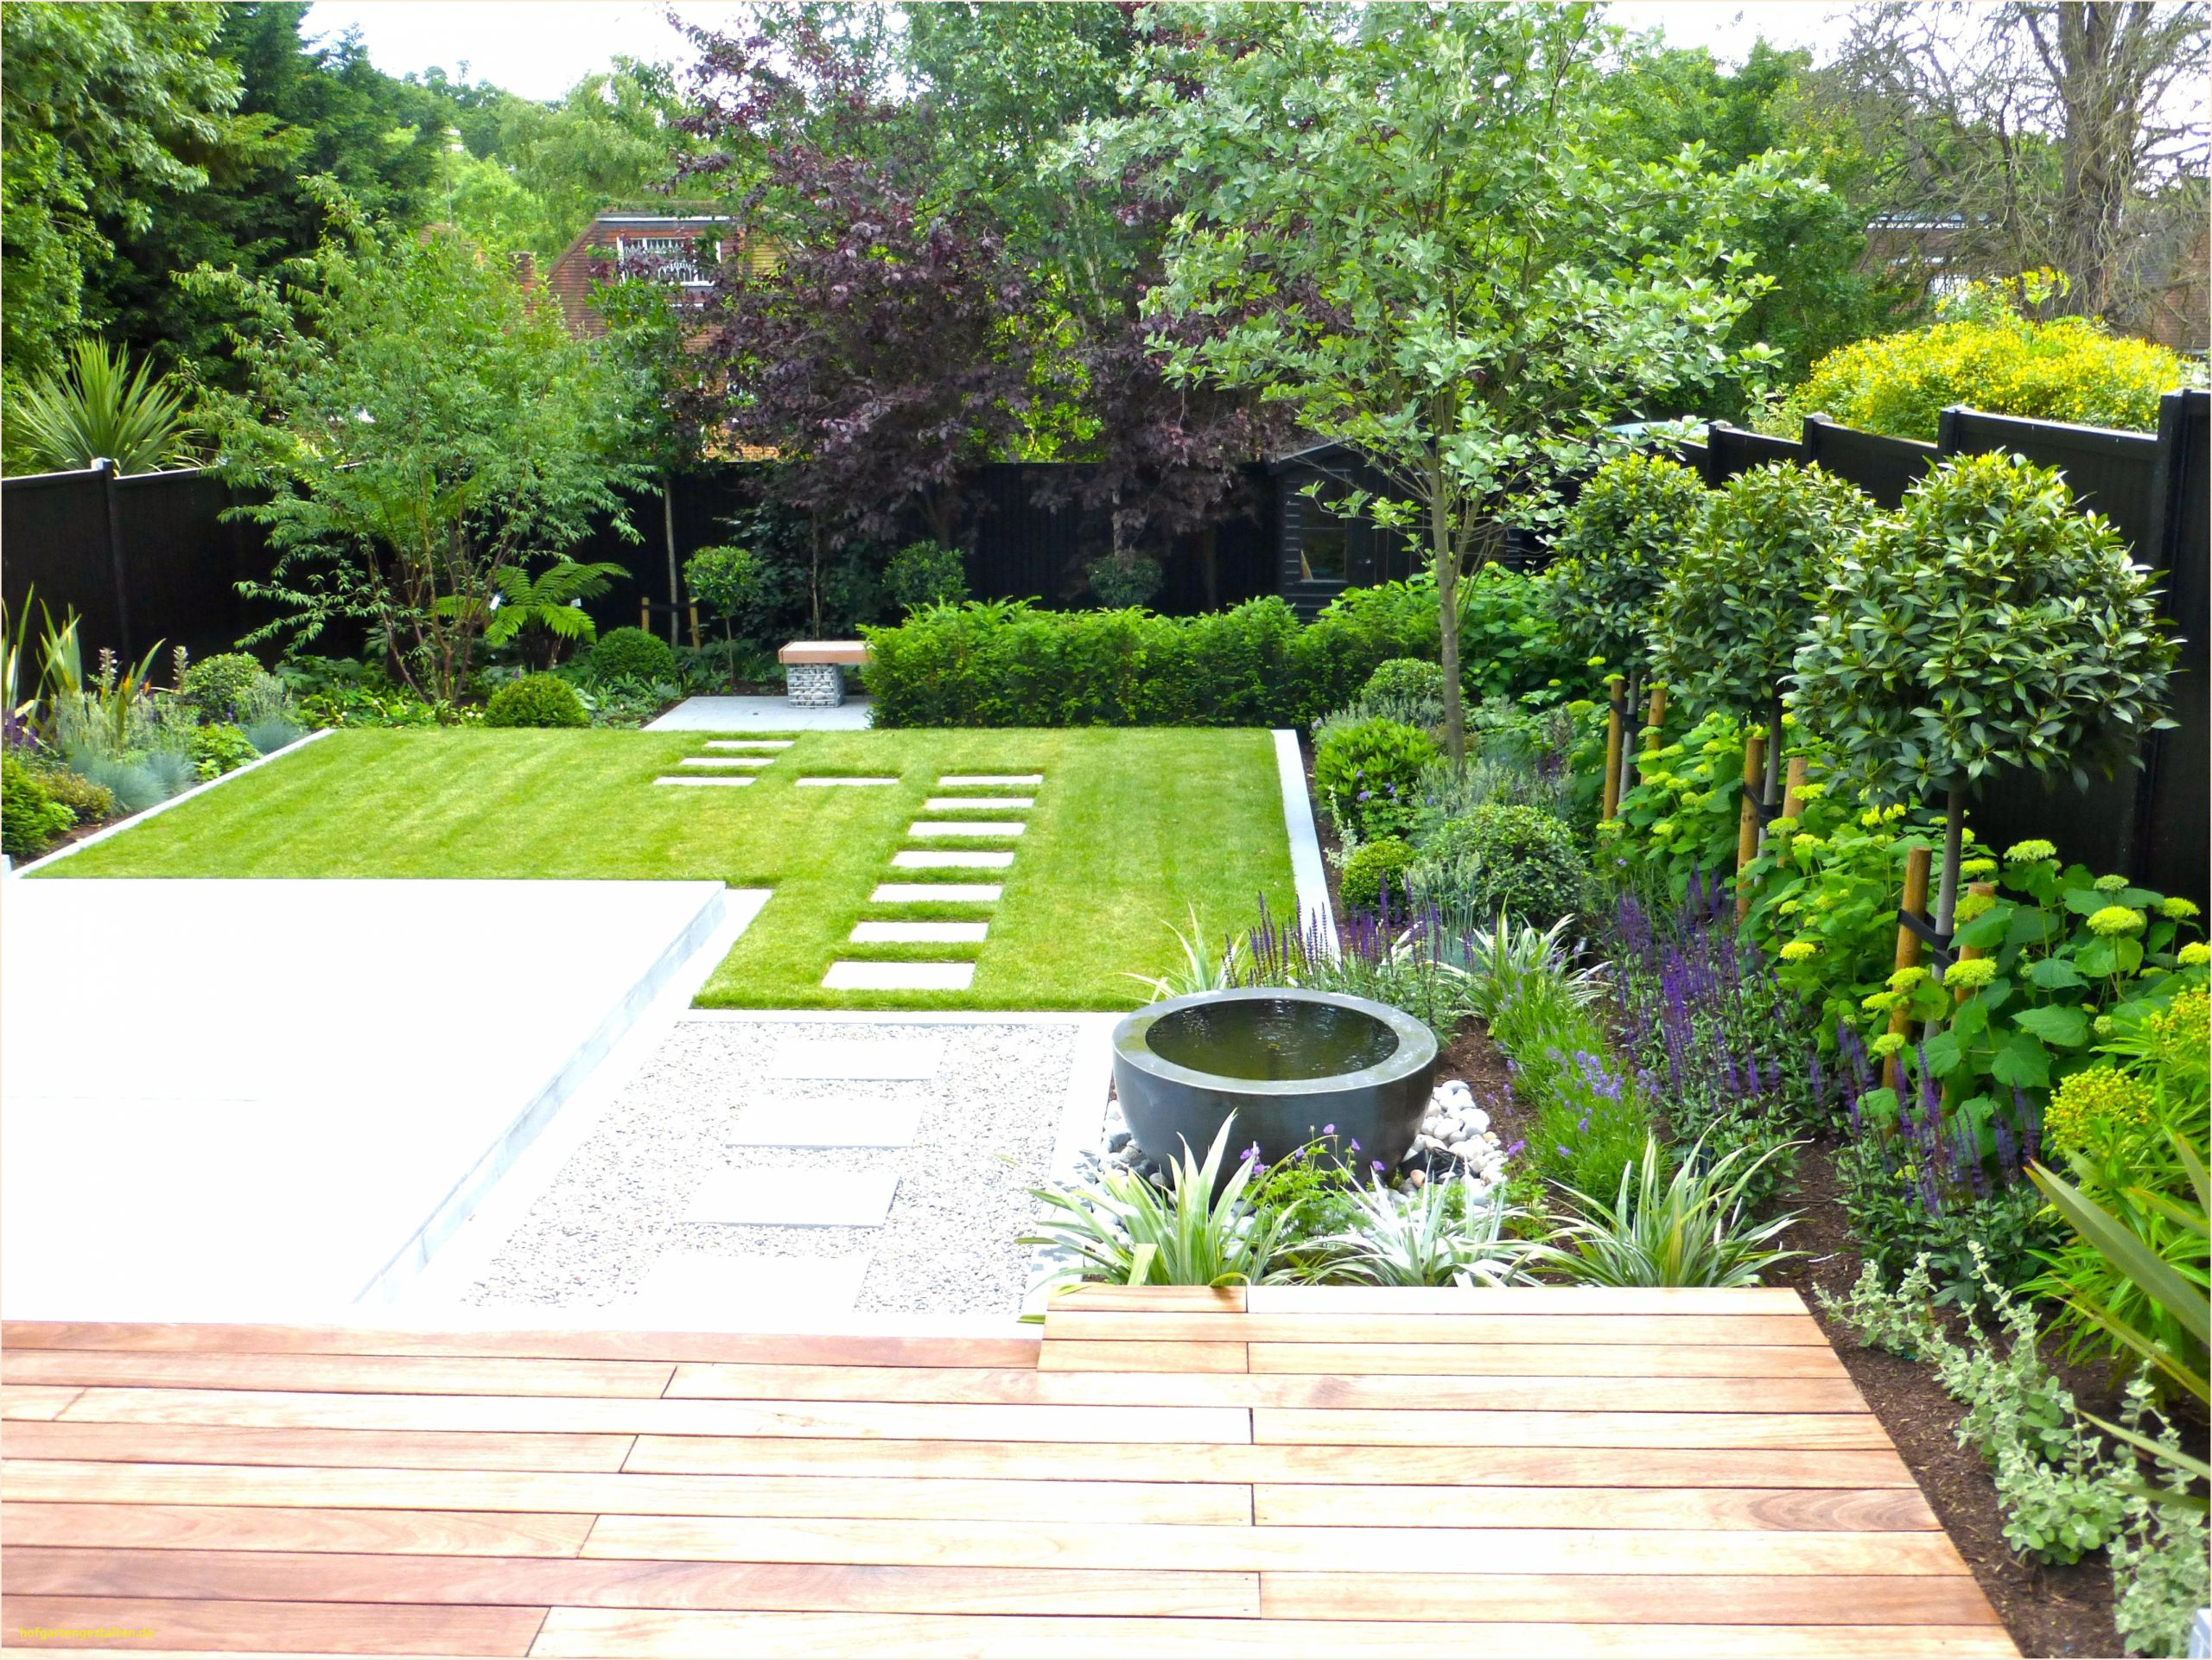 Alten Garten Neu Gestalten Inspirierend Alten Garten Neu Anlegen — Temobardz Home Blog